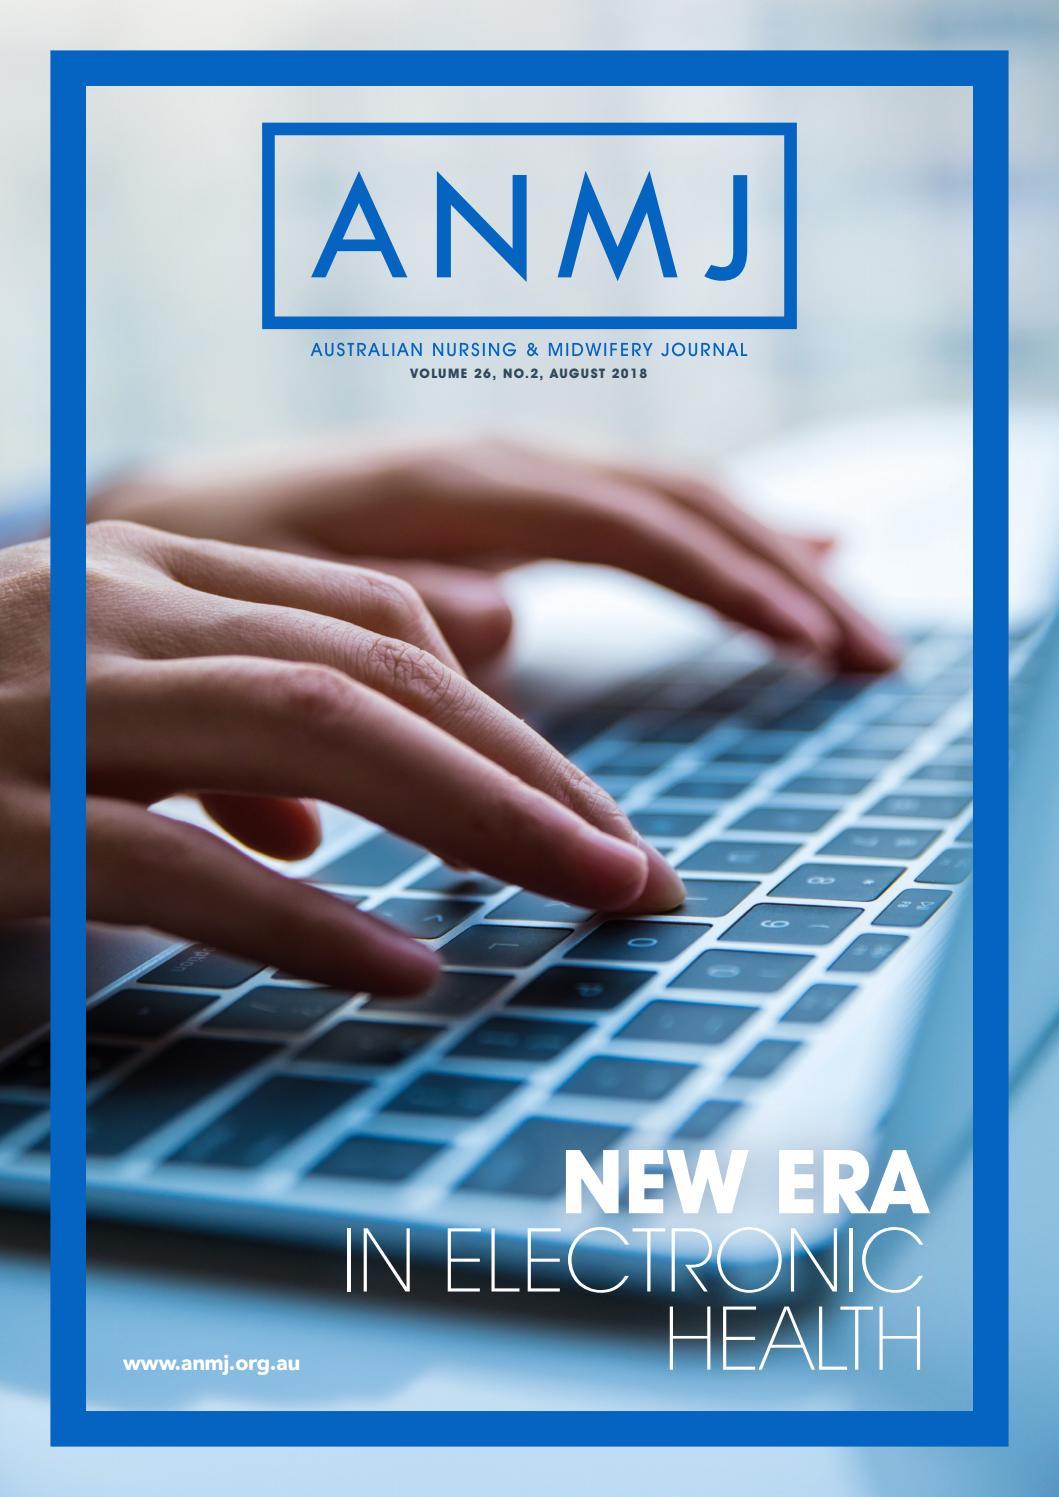 Anmj August 2018 By Australian Nursing Midwifery Journal Issuu Tas Nurse Kit